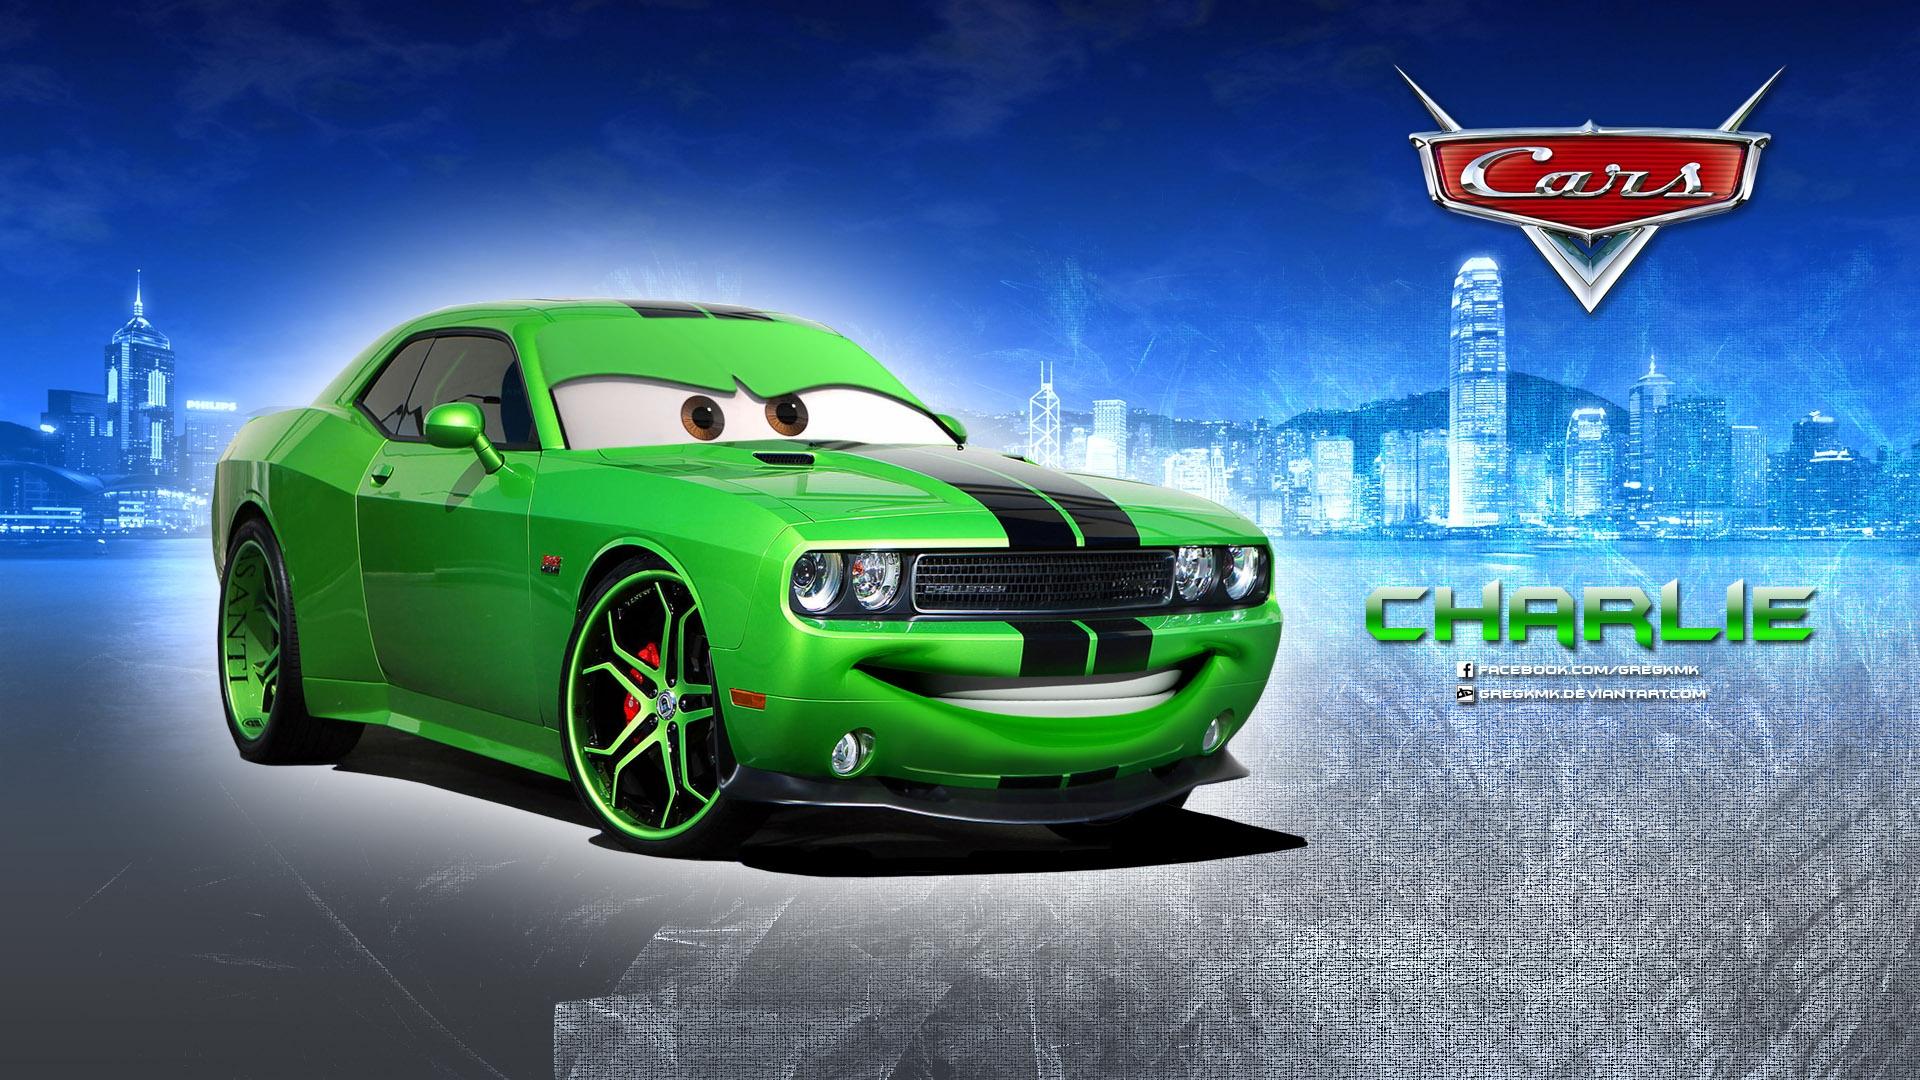 charlie dodge challenger disney pixar cars 1 2 free hd wallpaper